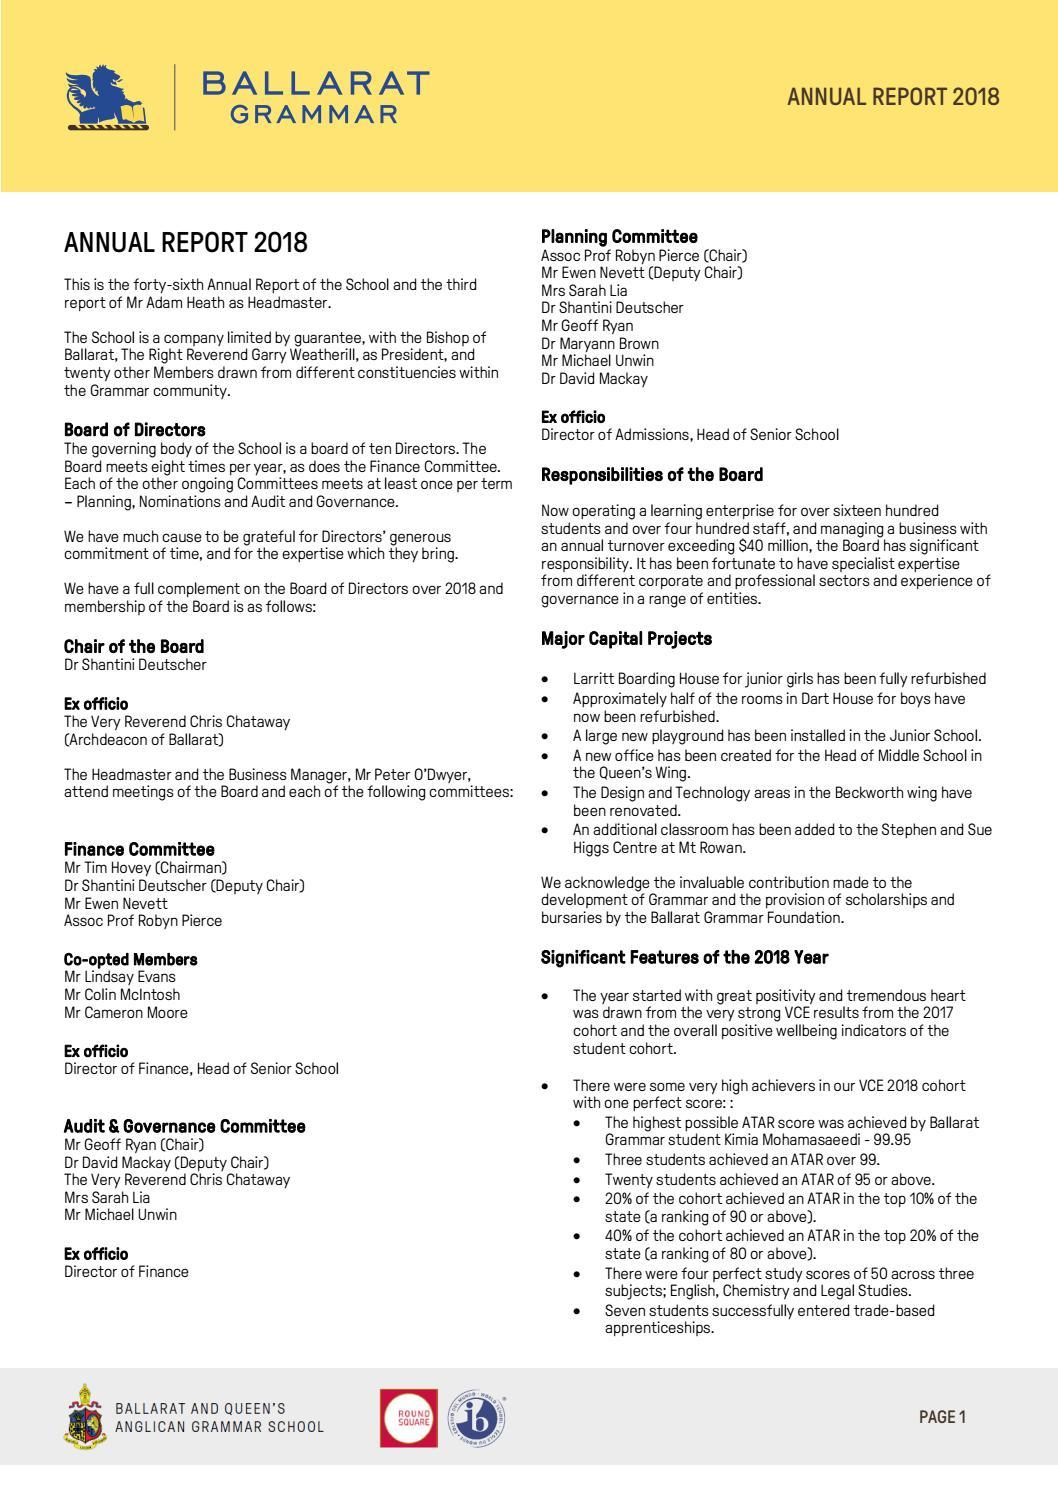 Ballarat Grammar Annual Report 2018 by ballaratgrammar - issuu